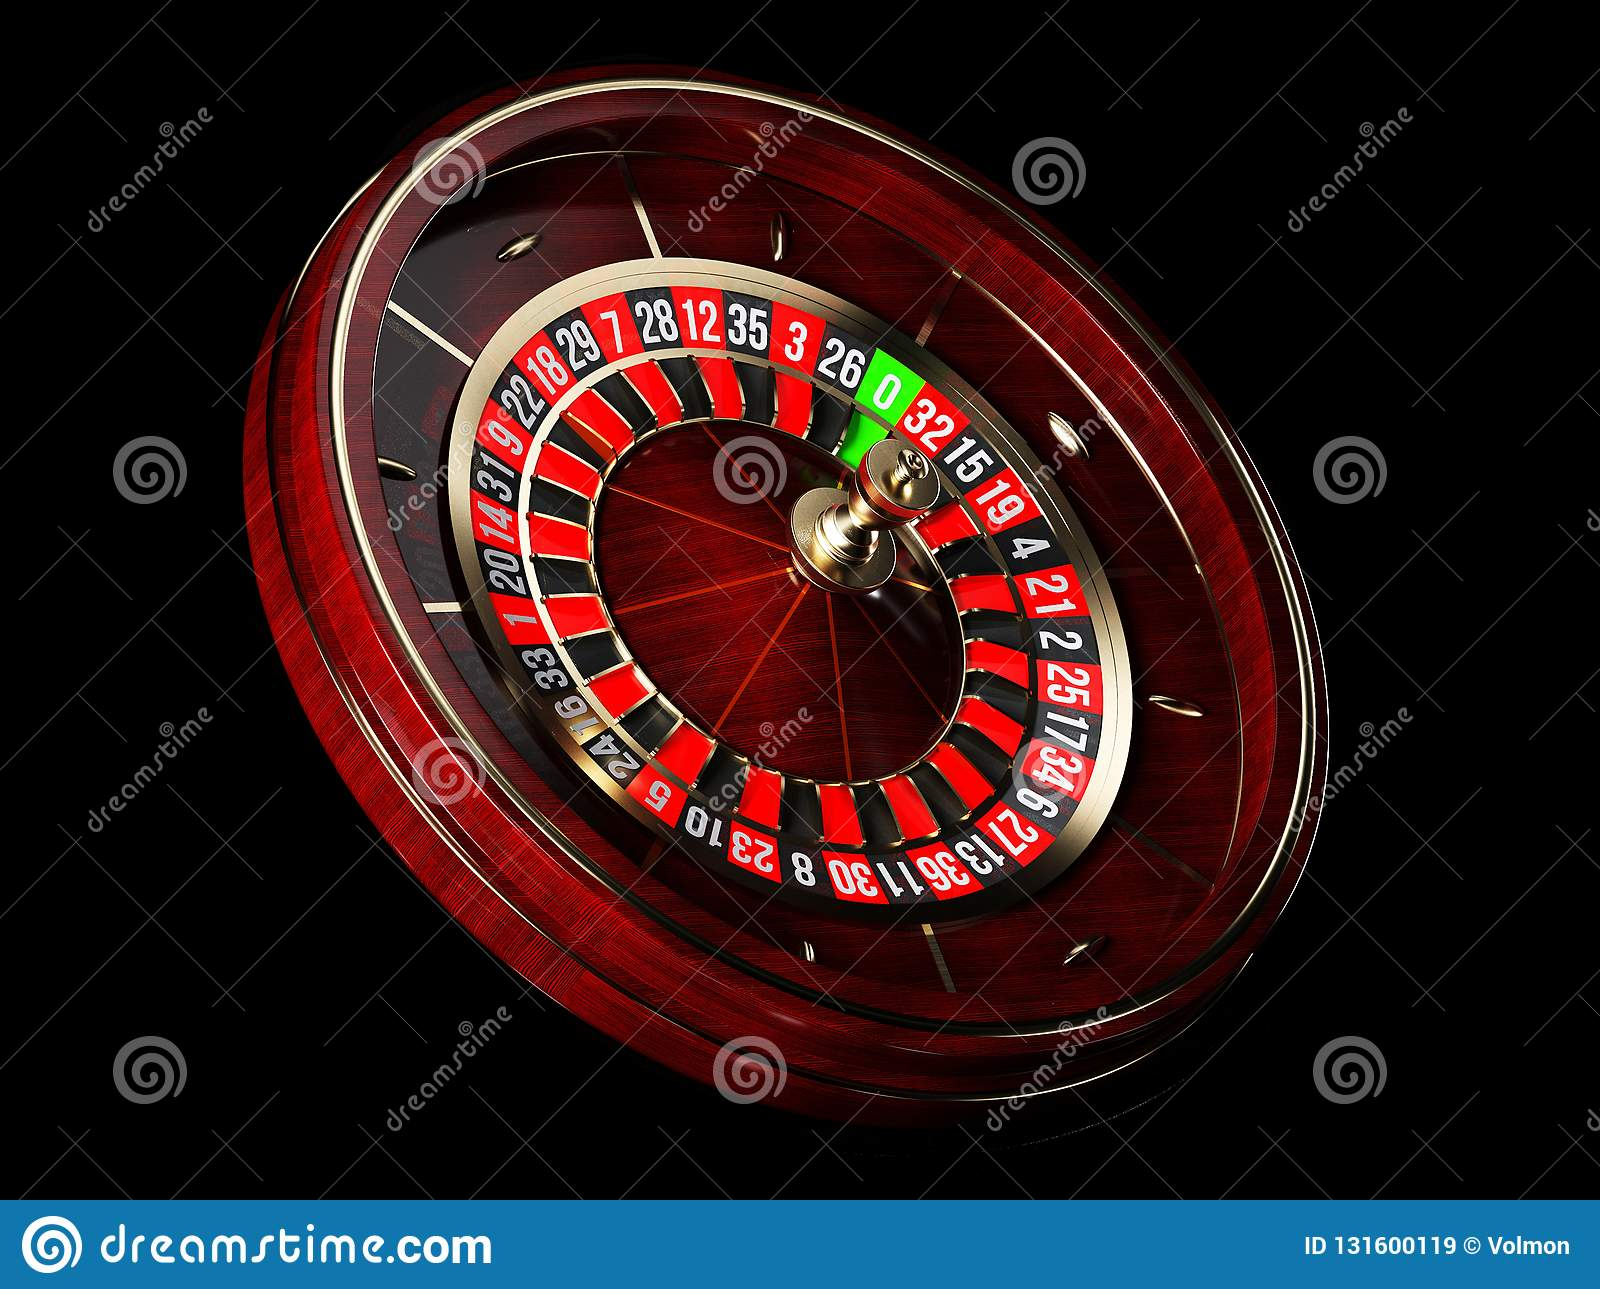 Супер слот интернет казино нижний новгород